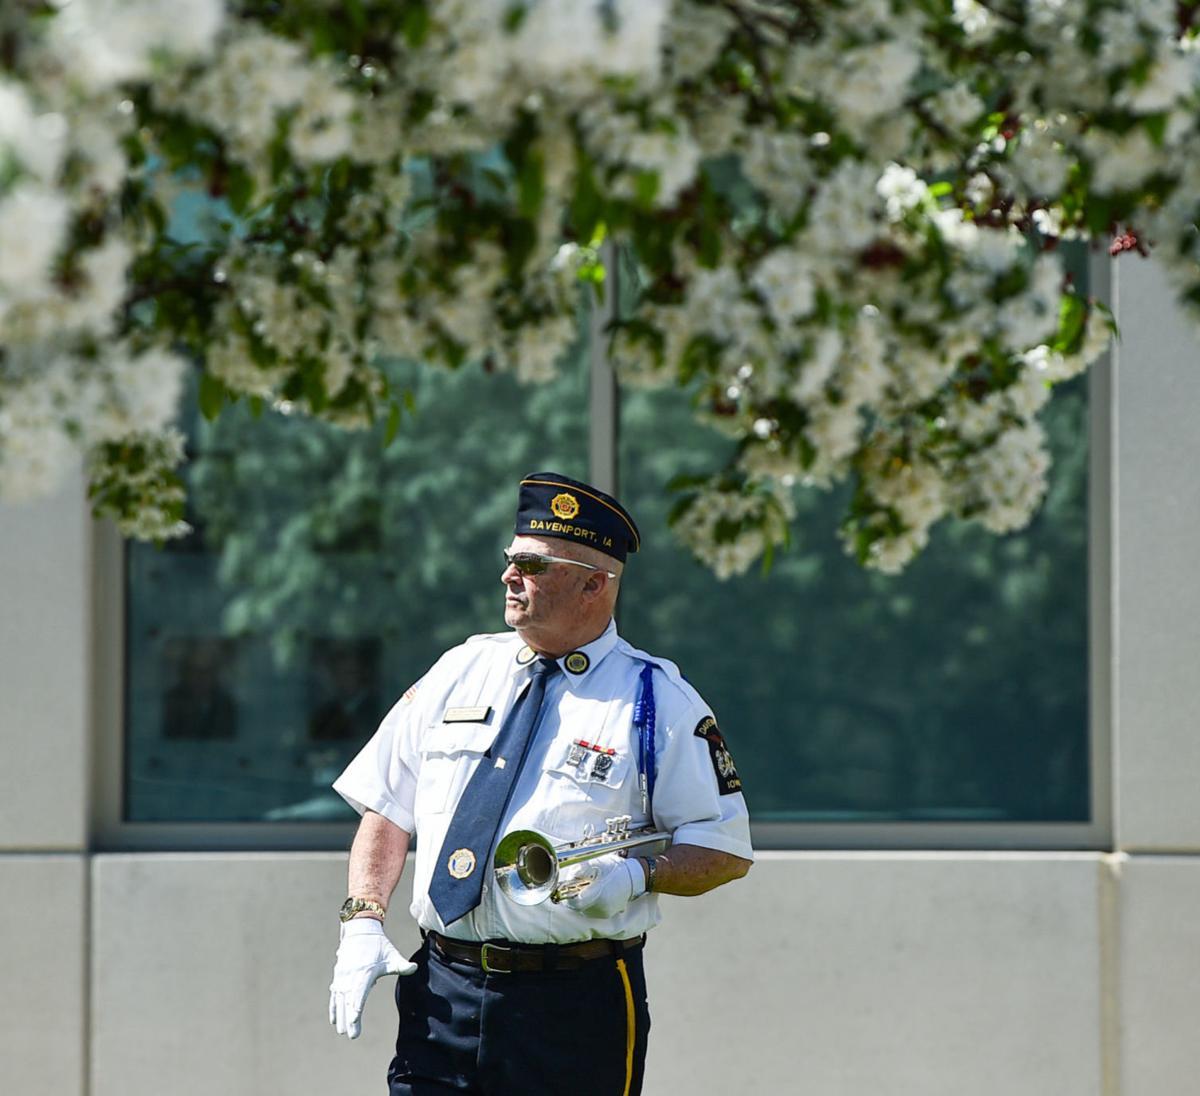 050420-qc-nws-policememorial-001